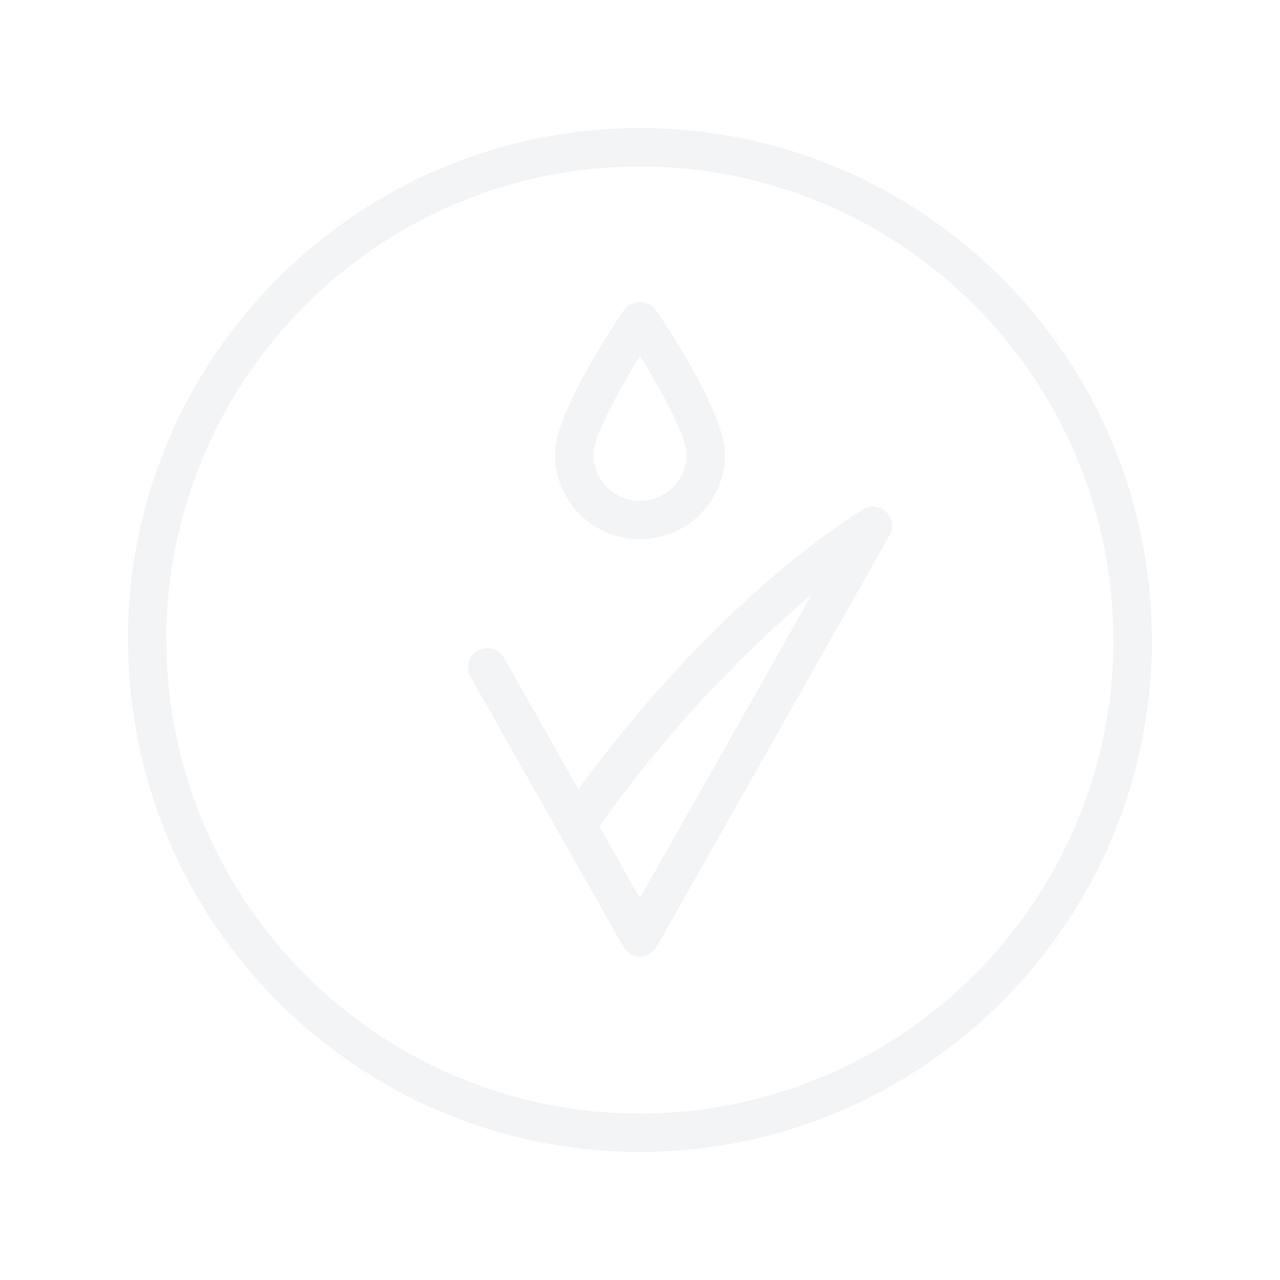 MISSHA Time Revolution Nutritious Cream питательный крем 50ml